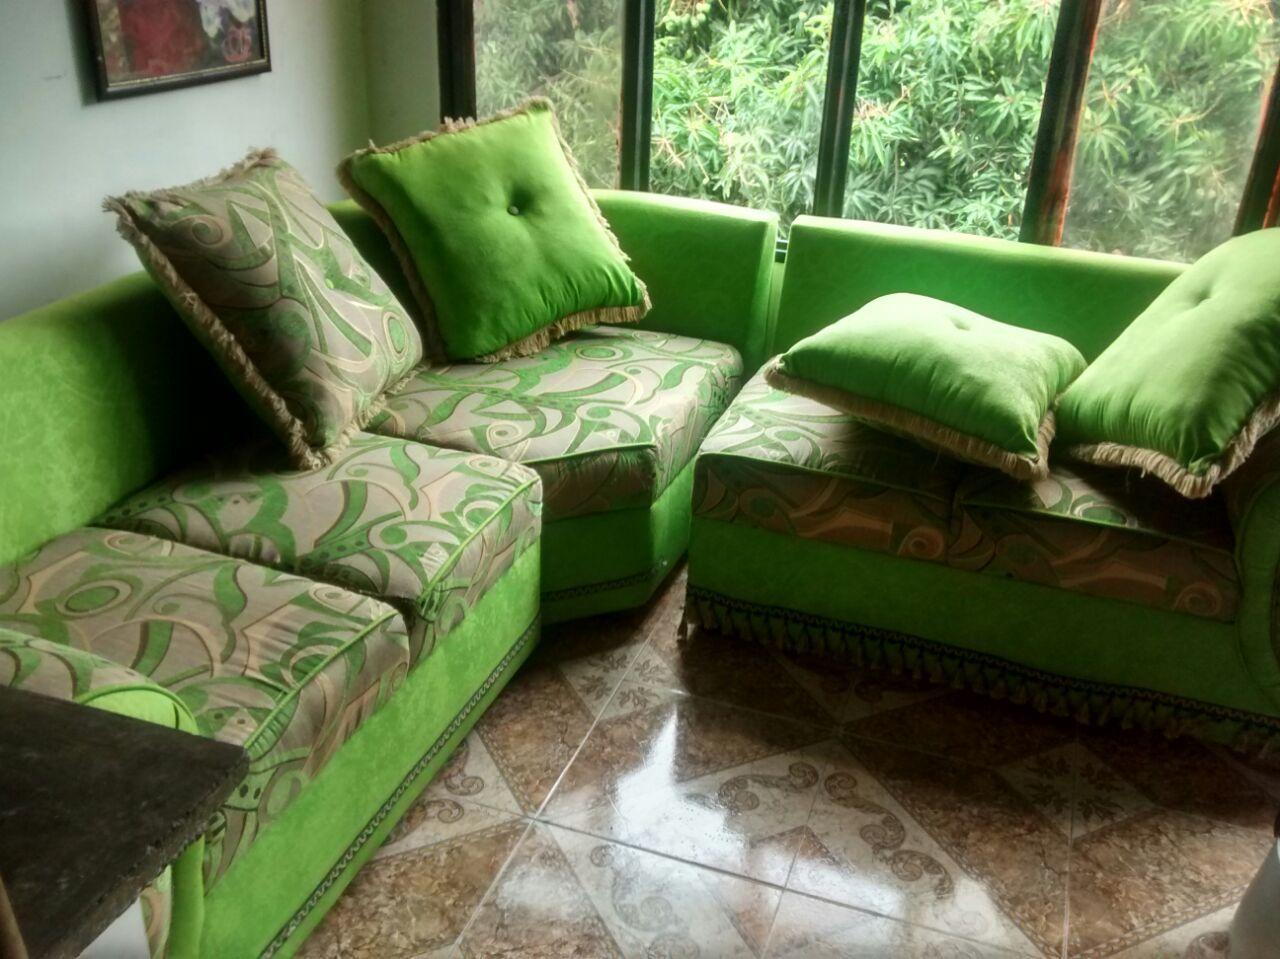 nosgustalavar | salas, alfombras lavado de muebles cali | Pinterest ...